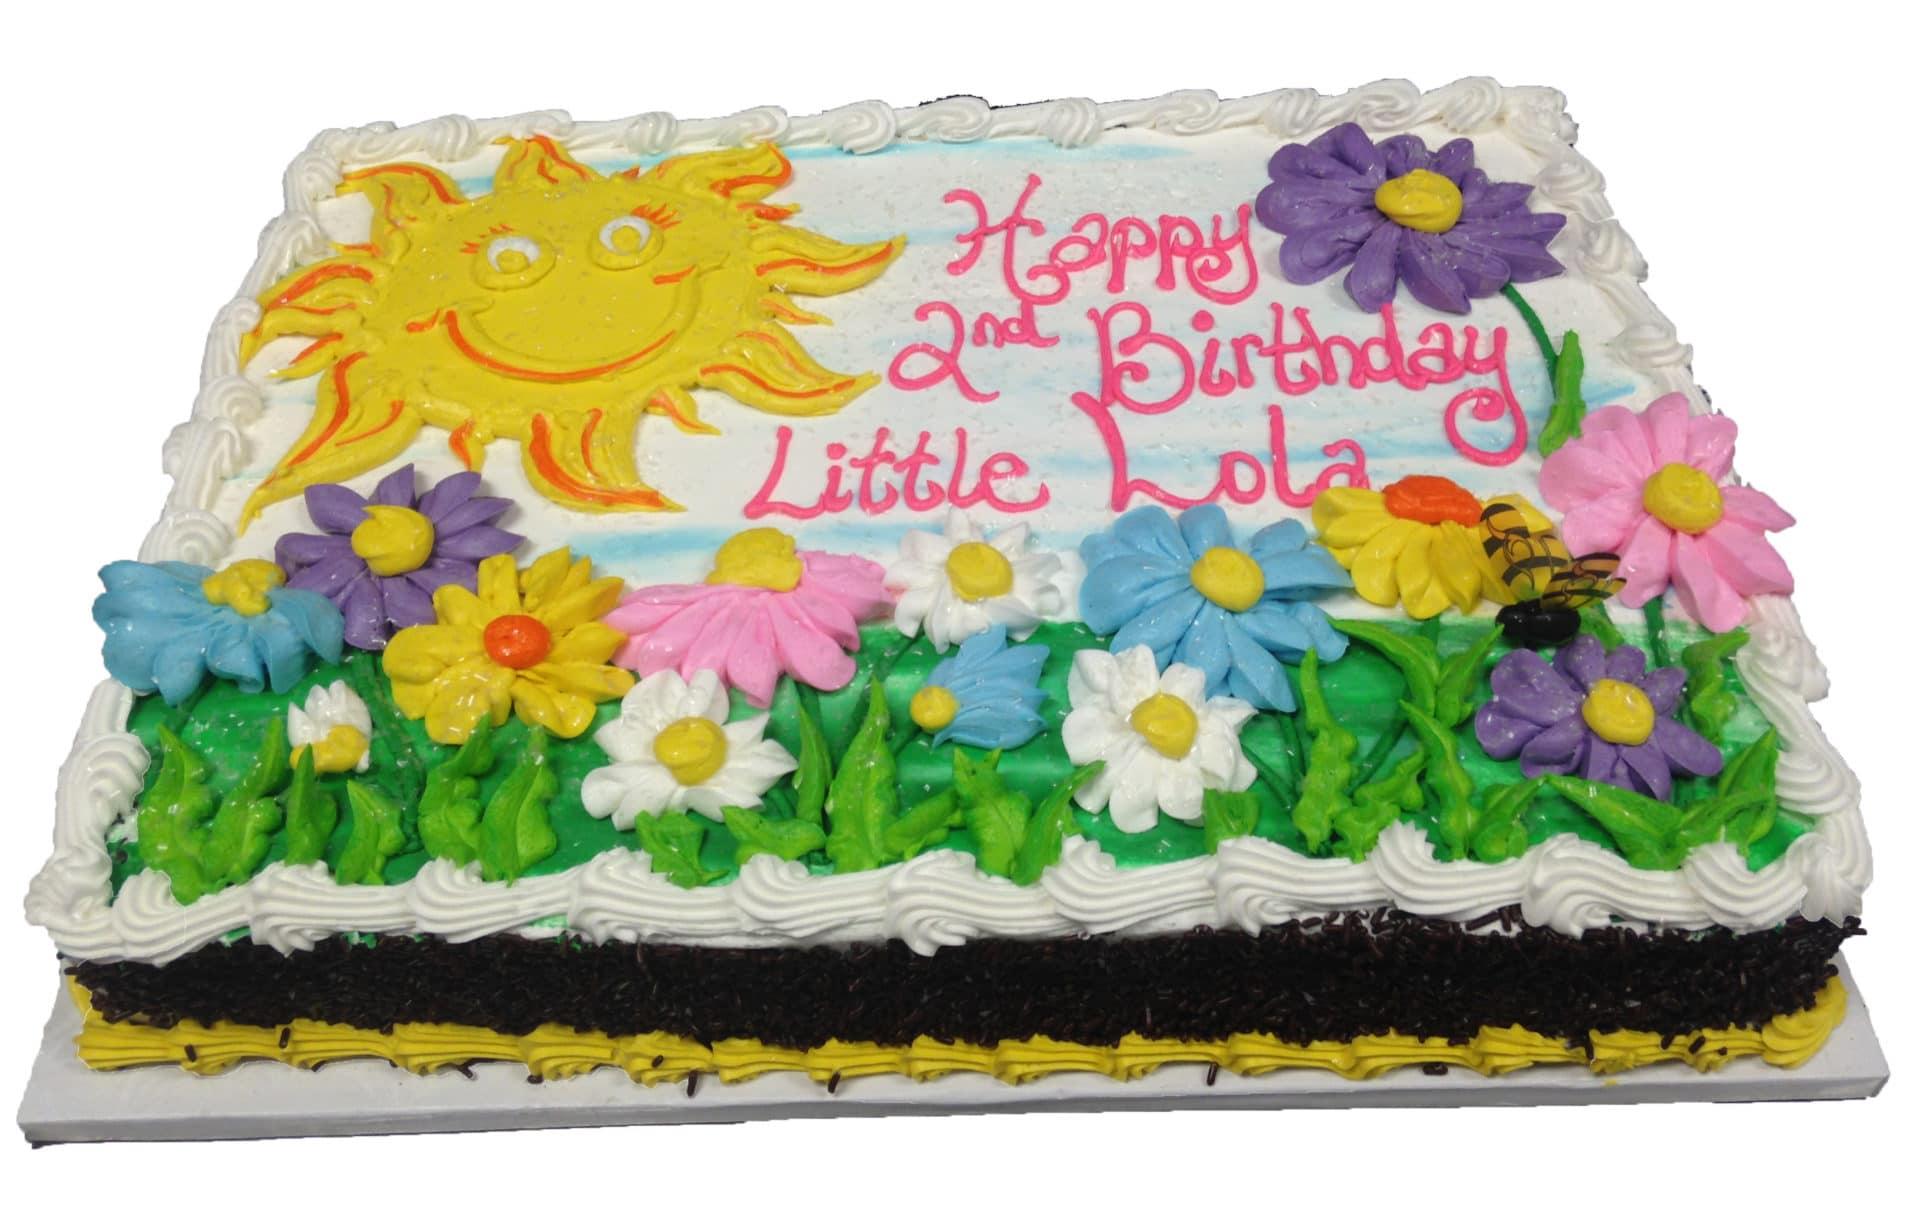 Birthday Cake 32 Aggies Bakery Cake Shop